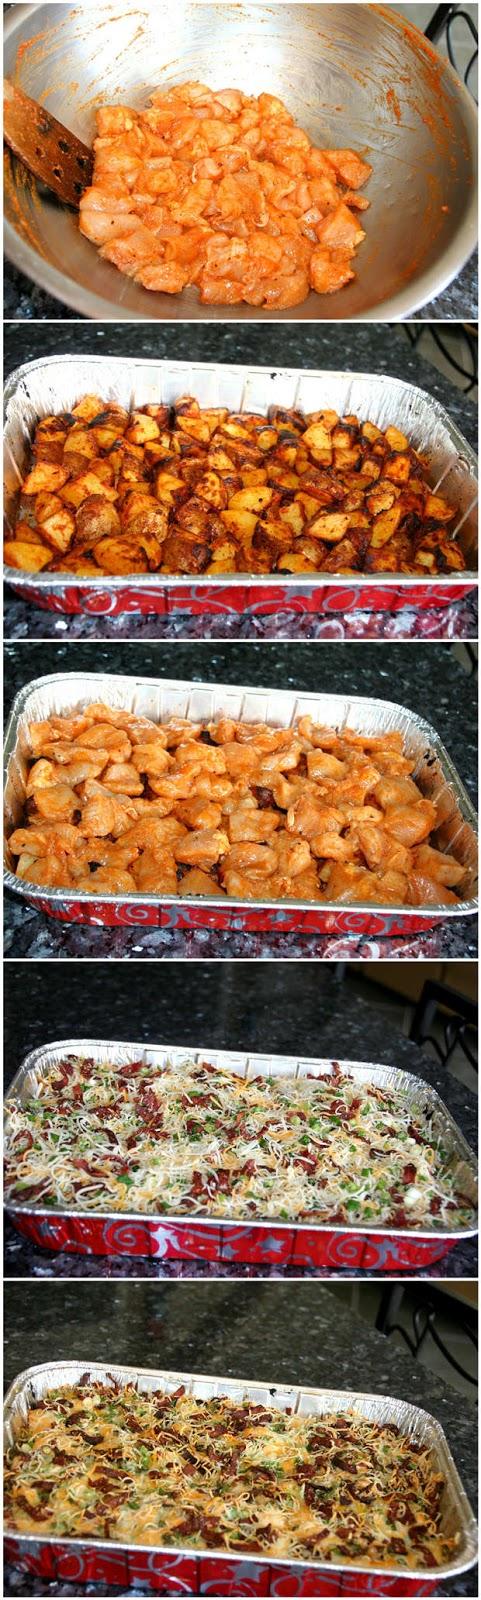 Slimmed-Down-Loaded-Potato-and-Buffalo-Chicken-Casserole